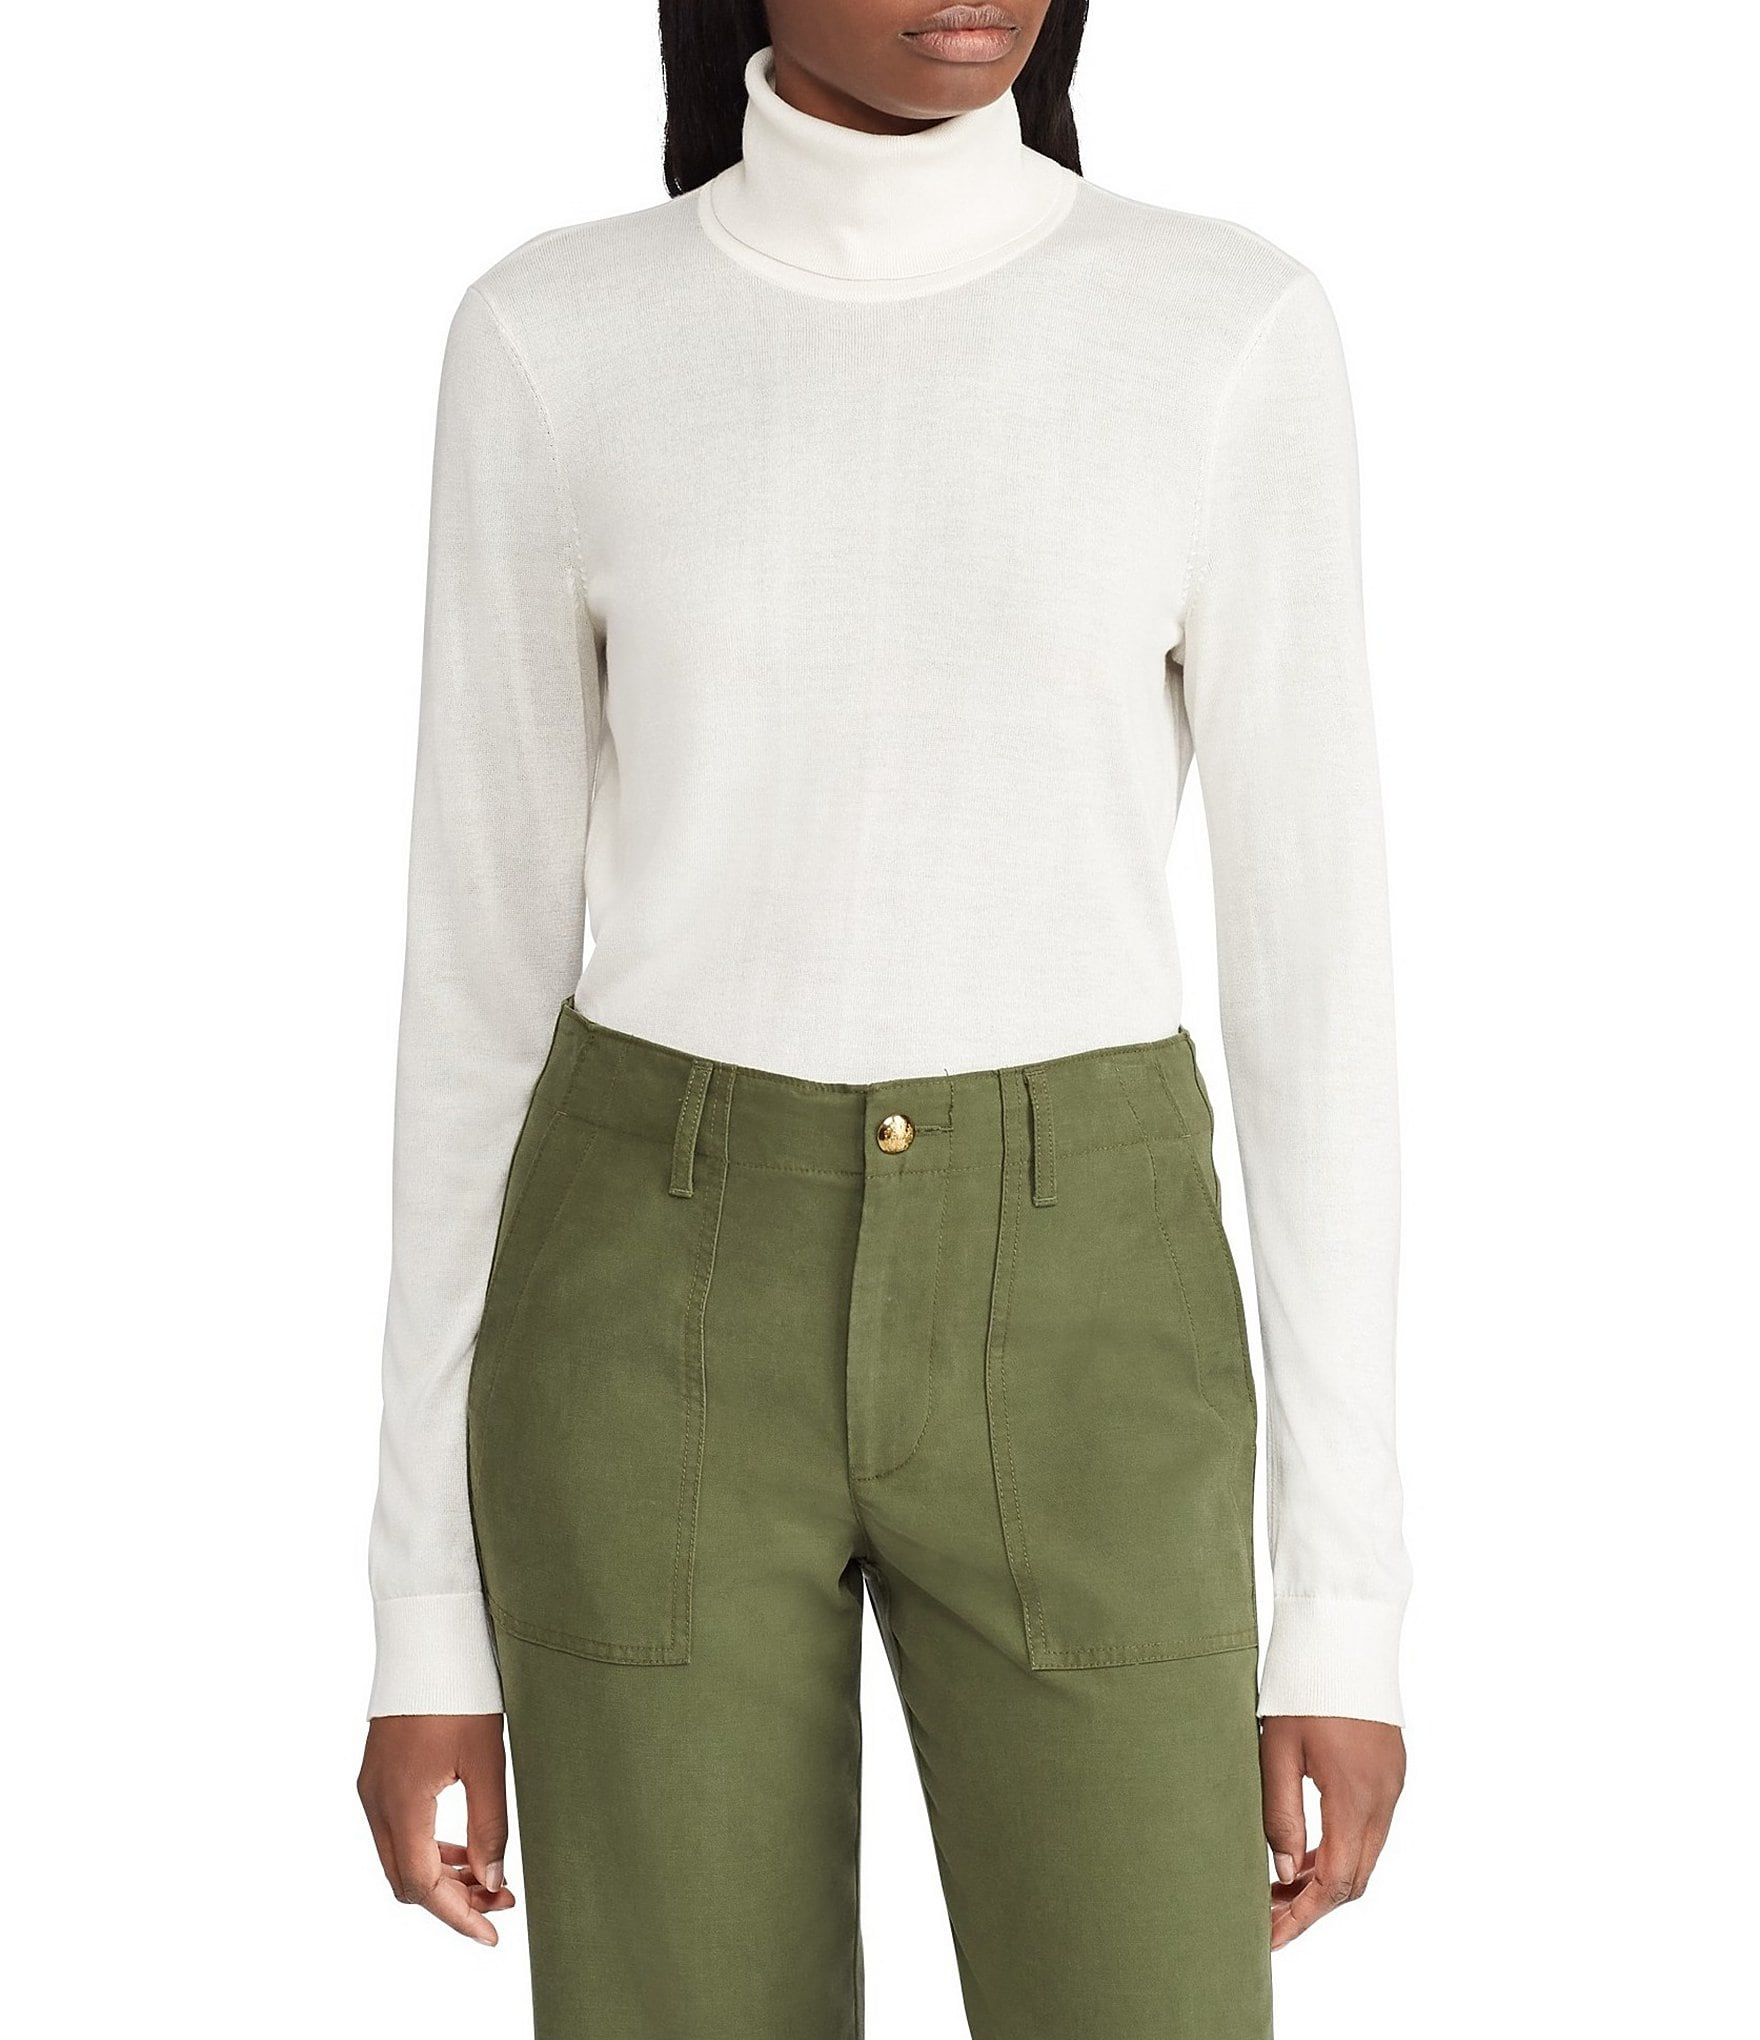 Women\'s Casual & Dressy Tops & Blouses | Dillards